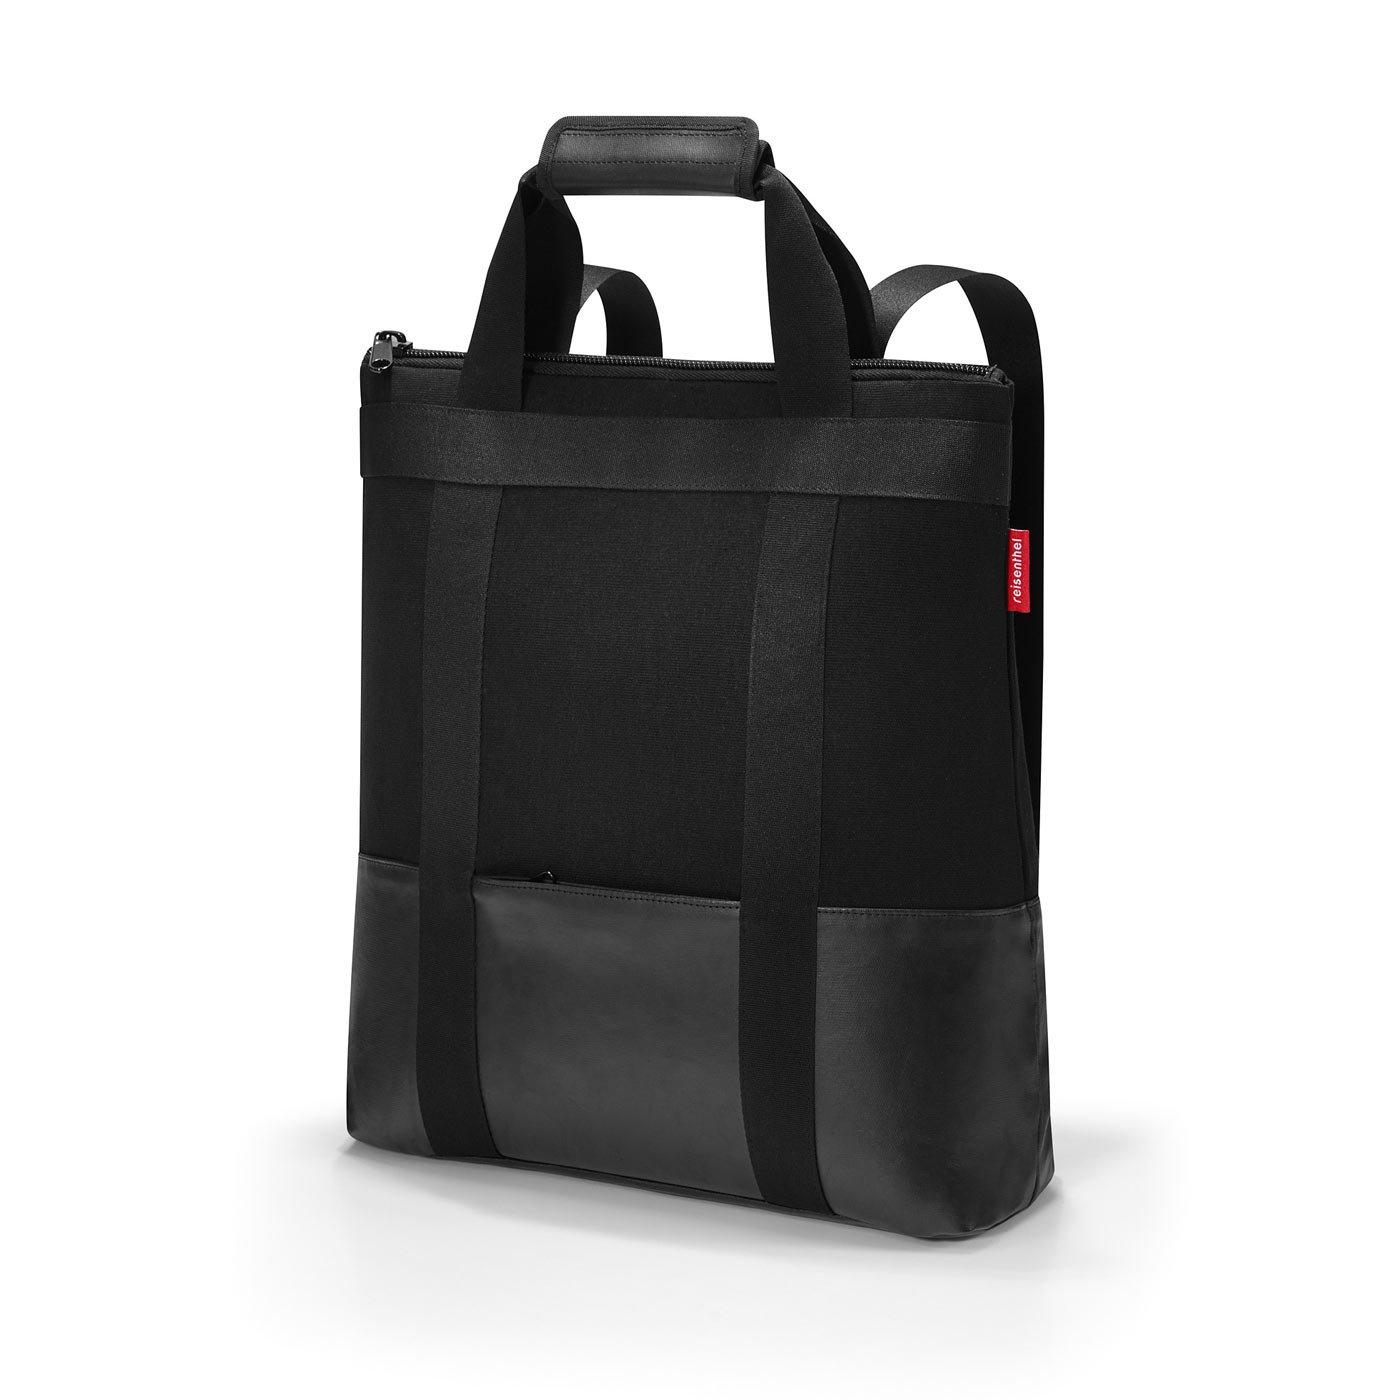 59092320c54 Batoh Daypack canvas black HH7047